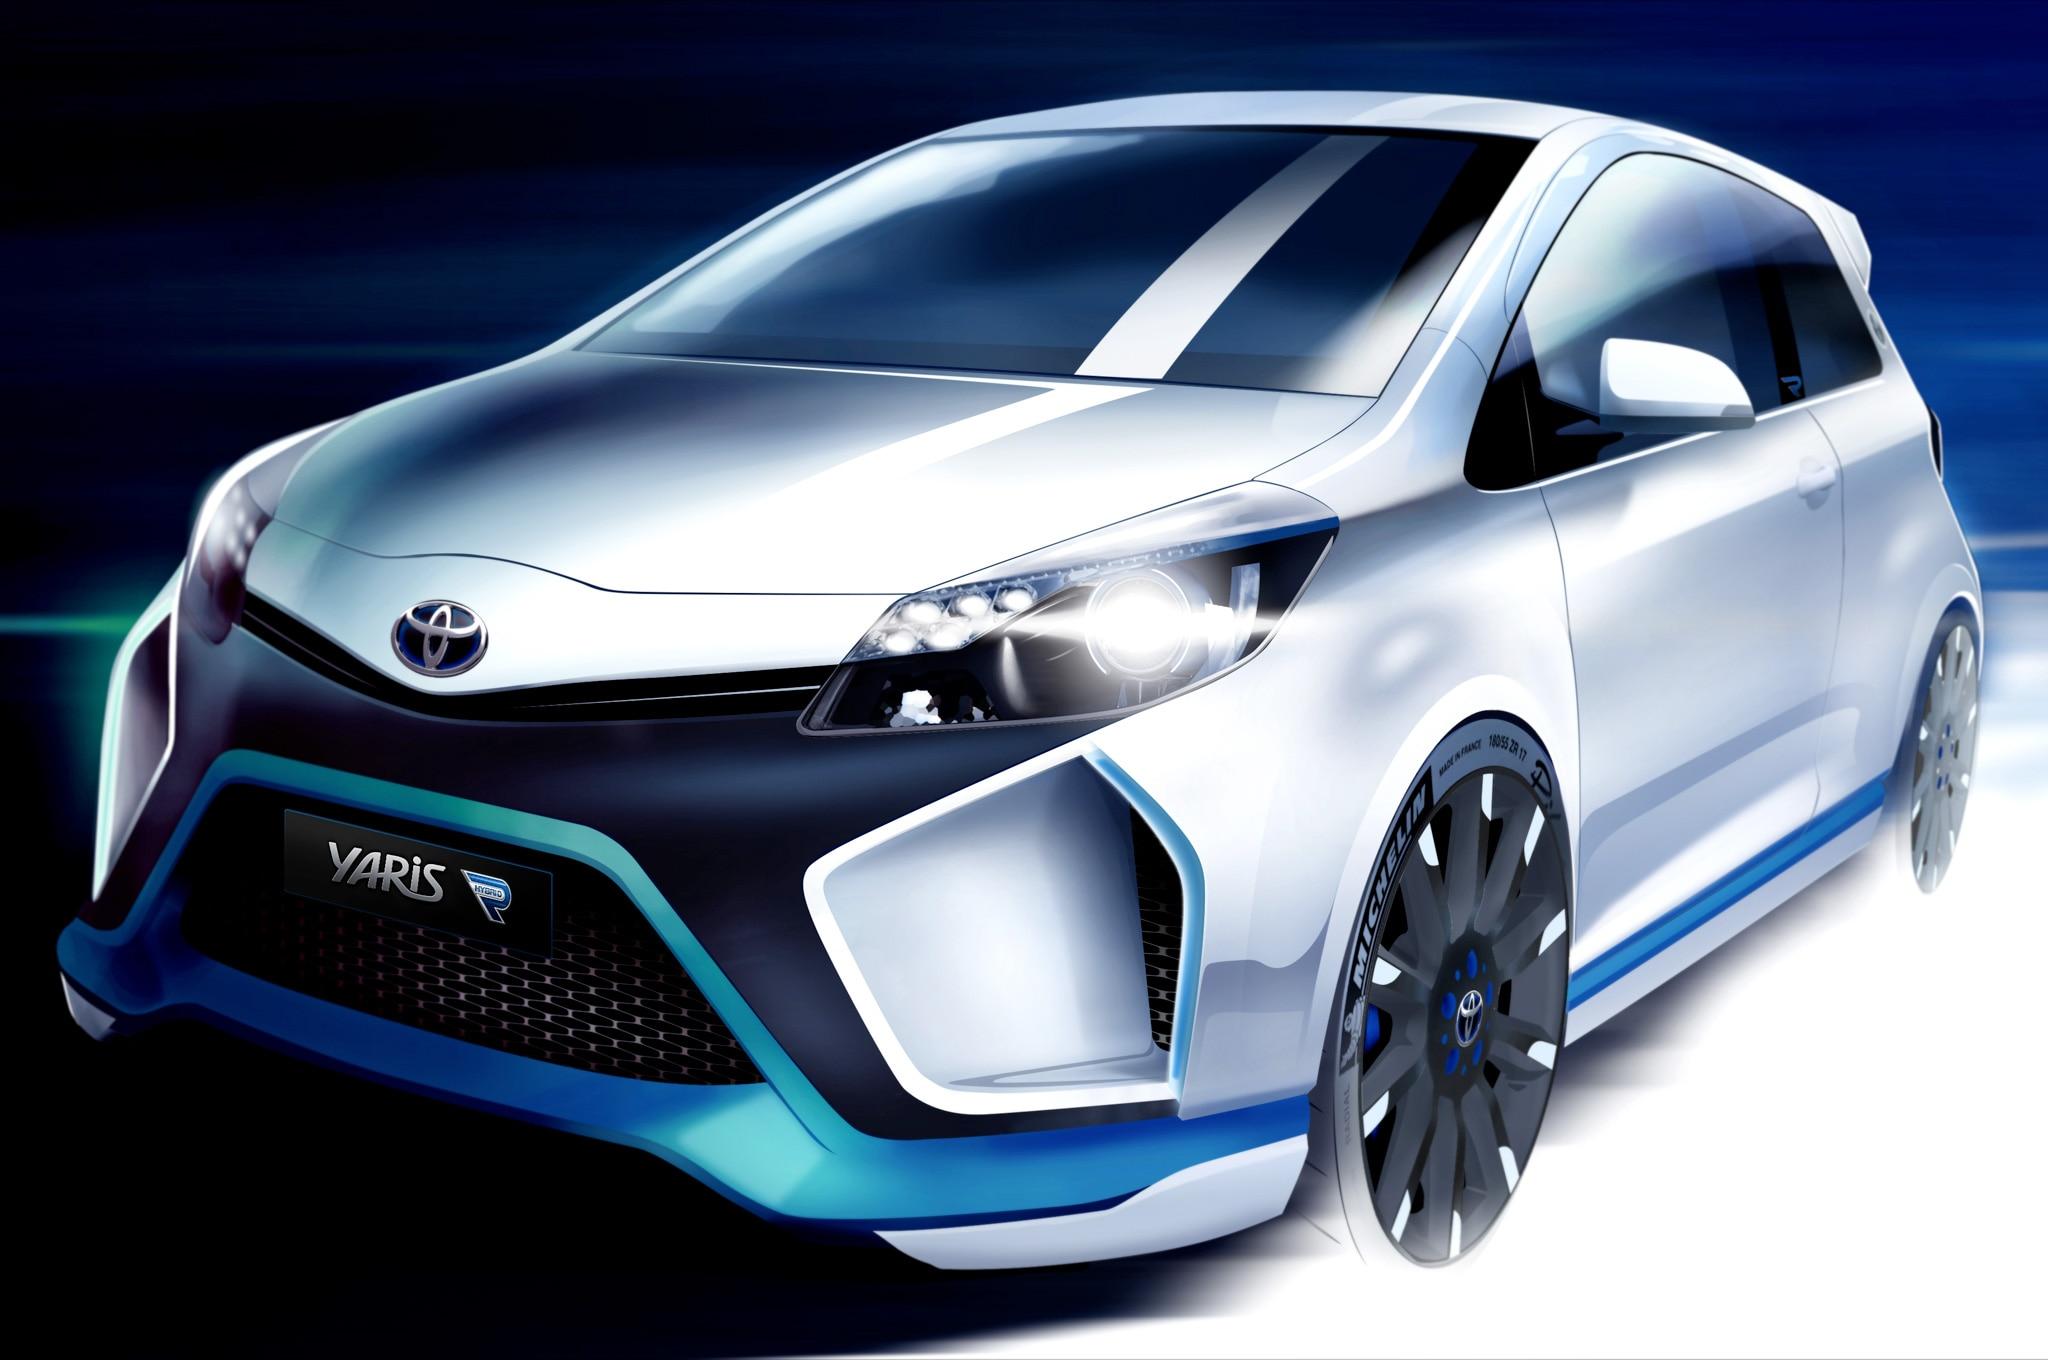 Toyota Yaris Hybrid R Concept Full Rendering Image